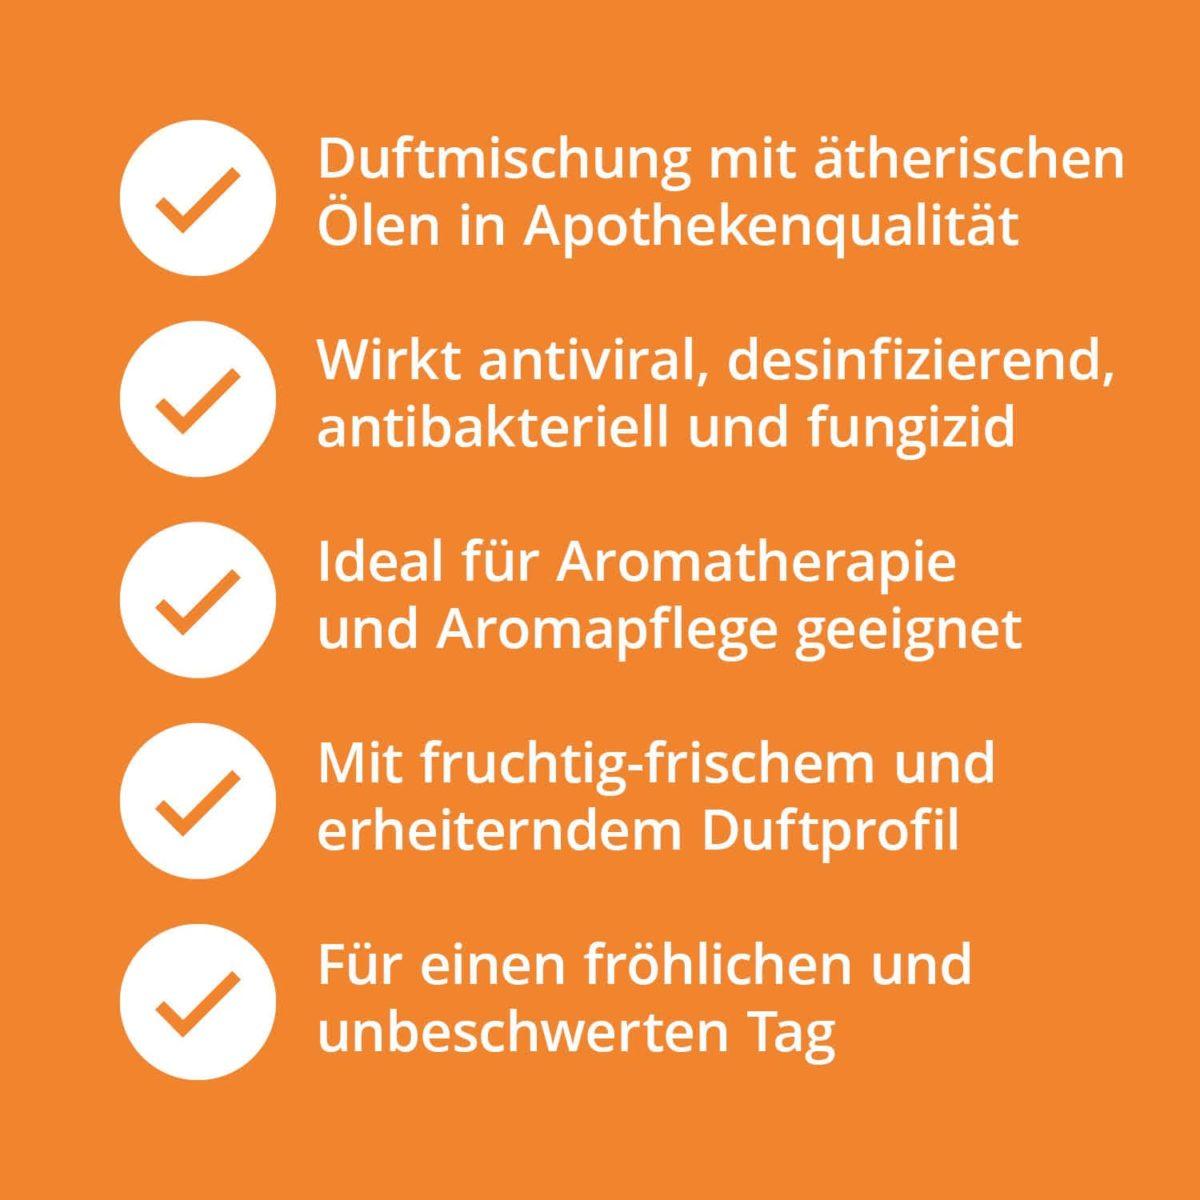 Casida Delightment Aroma-Blend Glück & Freude - 5 ml 17377217 PZN Apotheke aufheiternd gute laune Aromatherapie Aromapflege Aromaschmuck Diffuser7